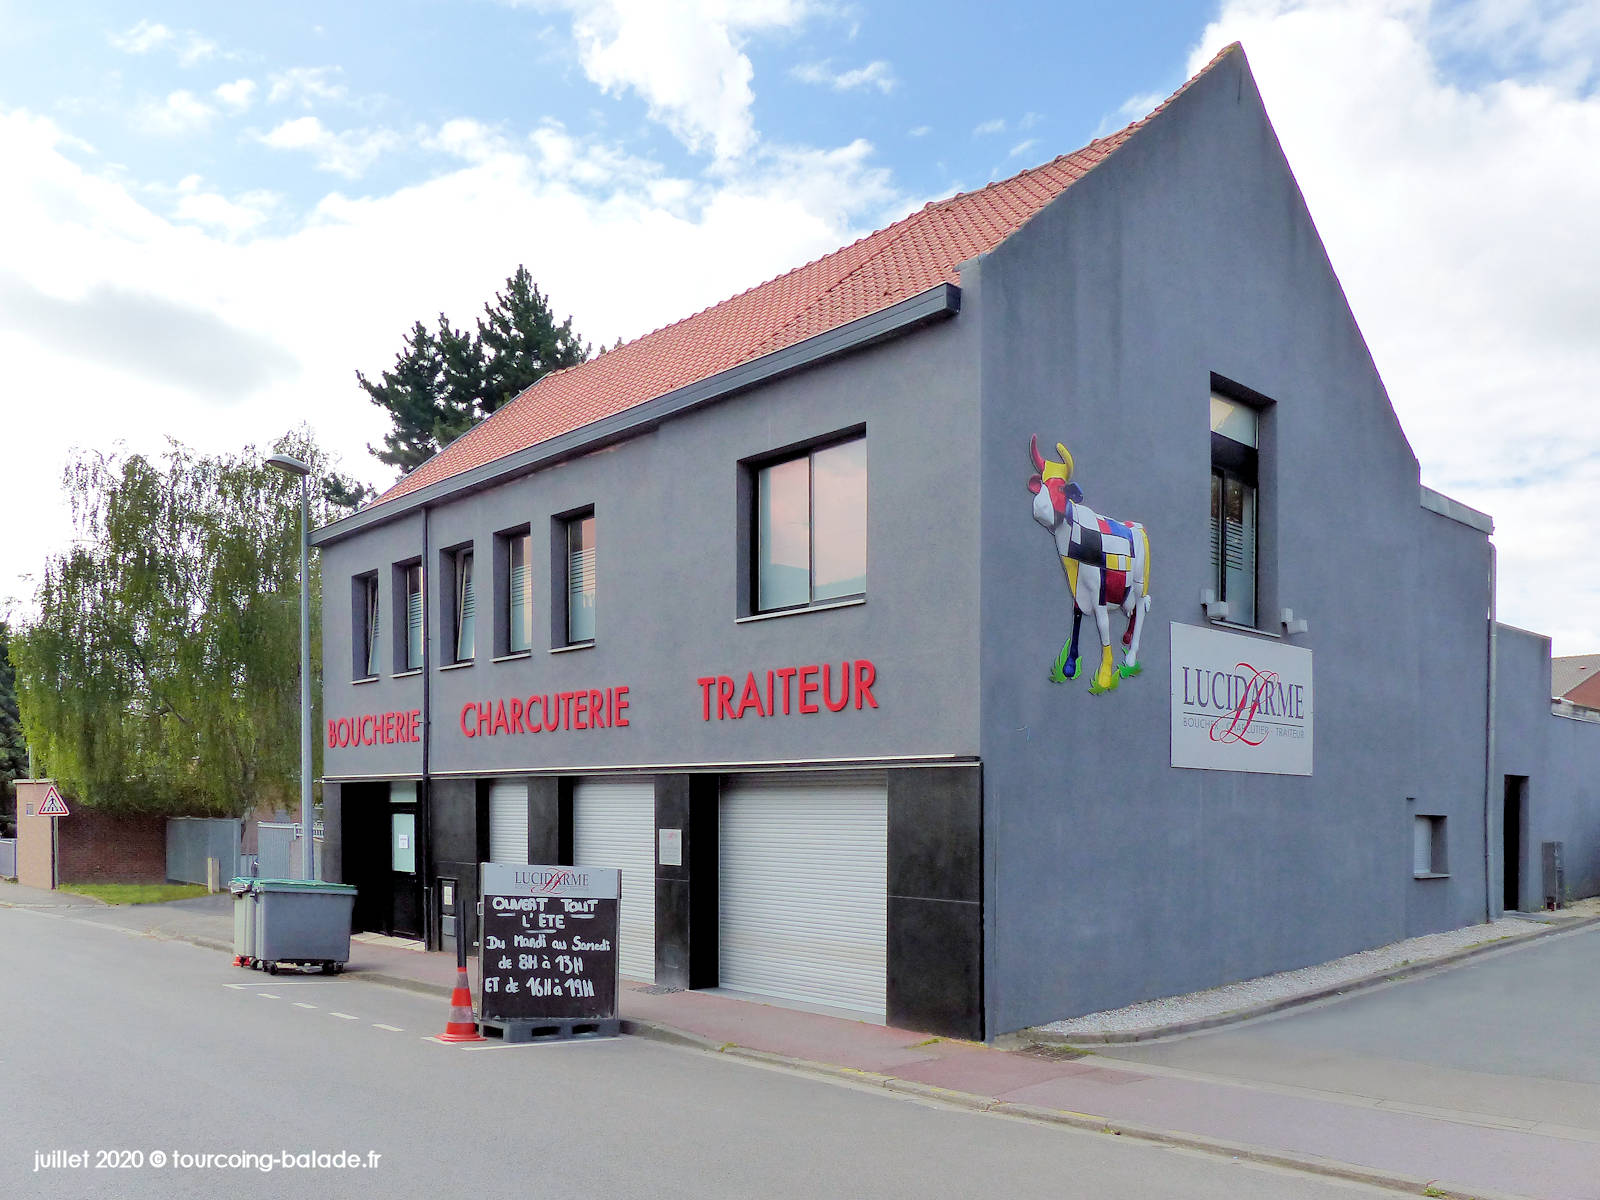 Boucherie Charcuterie Lucidarme Clinquet, Tourcoing 2020